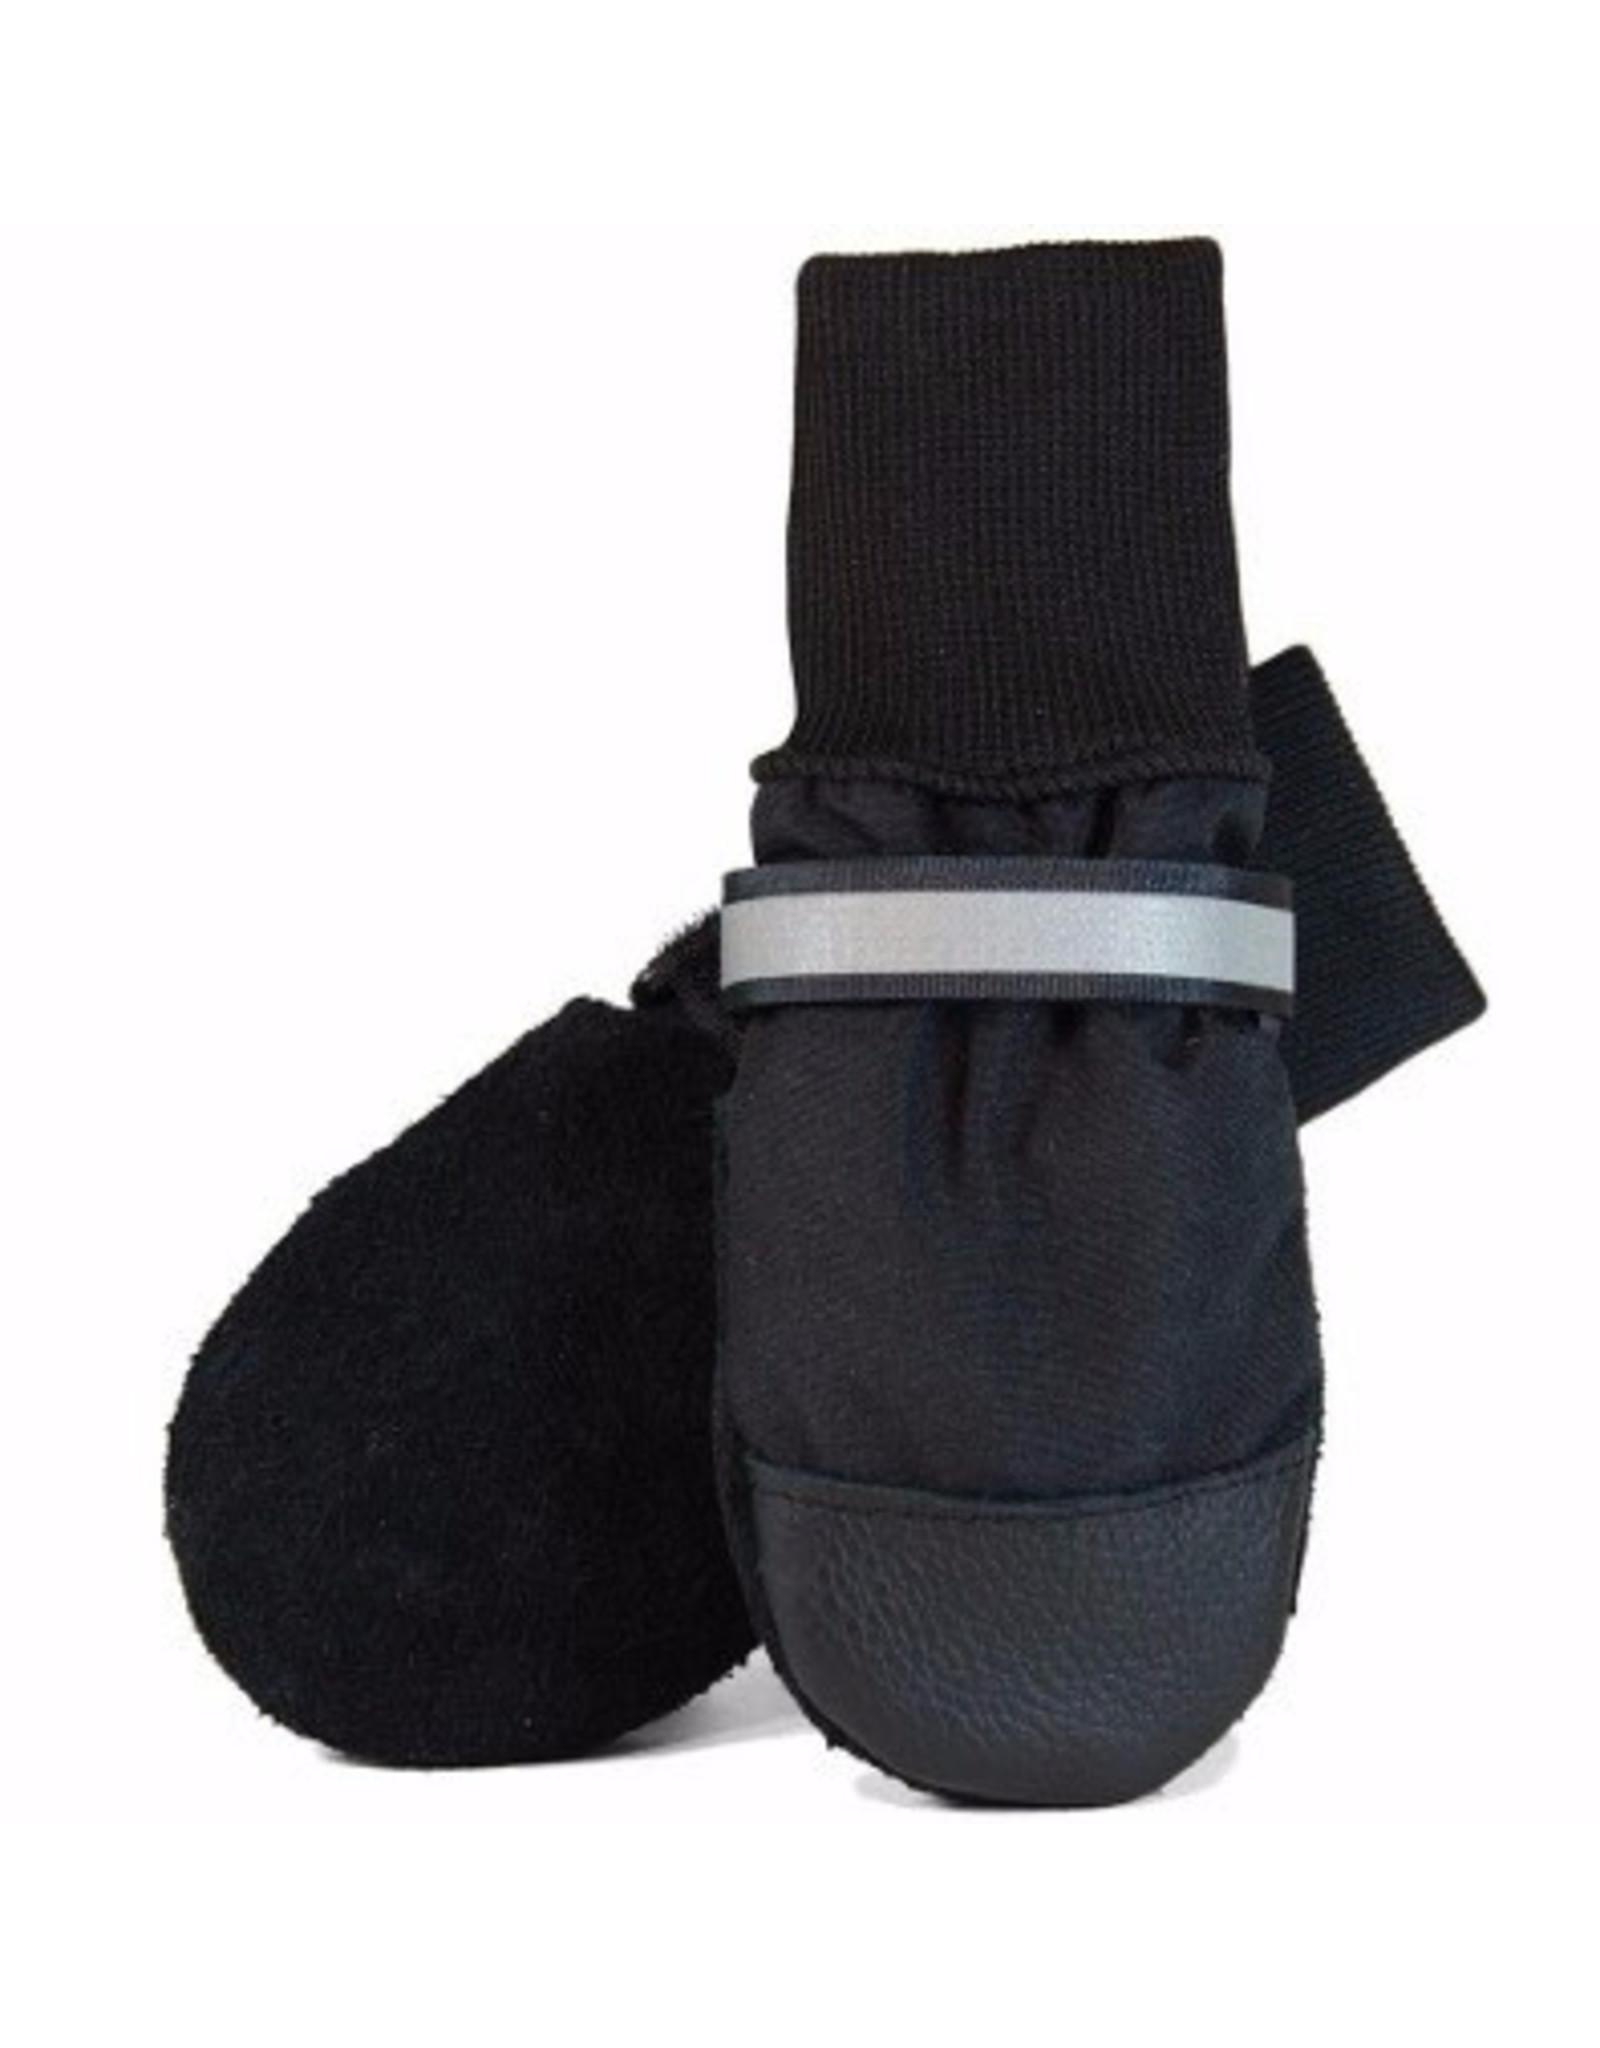 Muttluks Muttluks All-Weather Boots - Black M